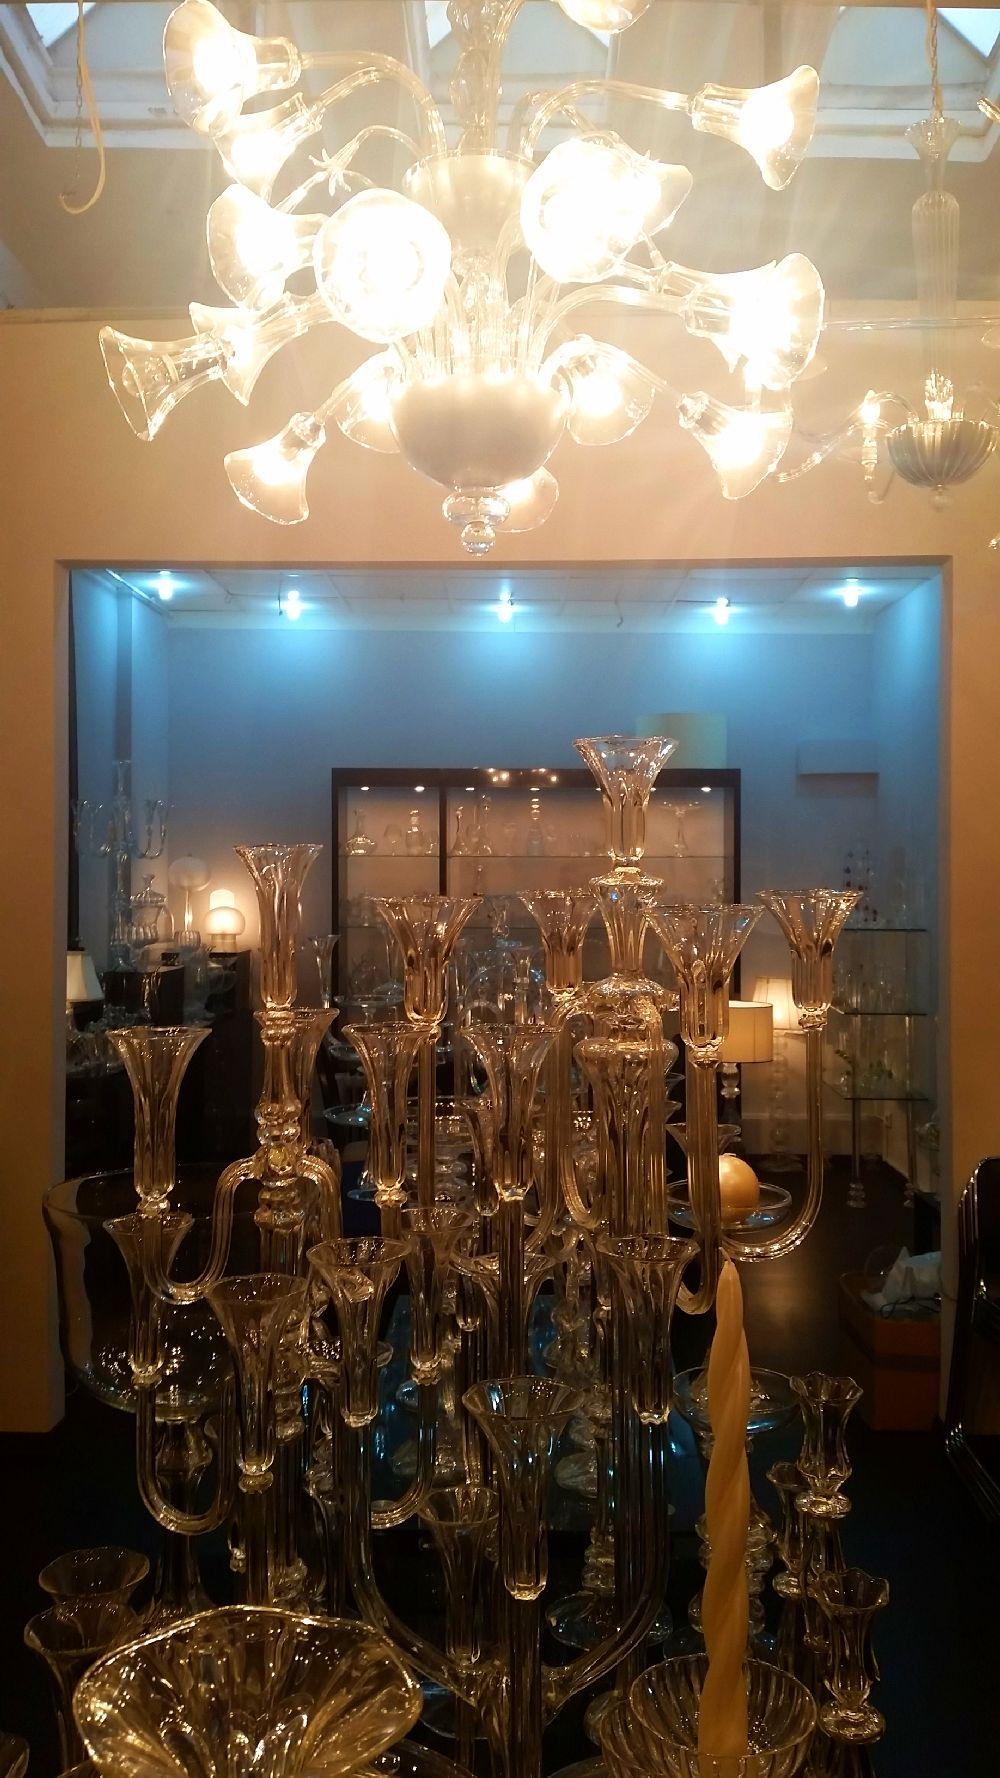 adelaparvu.com despre atelierul de sticlarie Gabriela Seres (56)